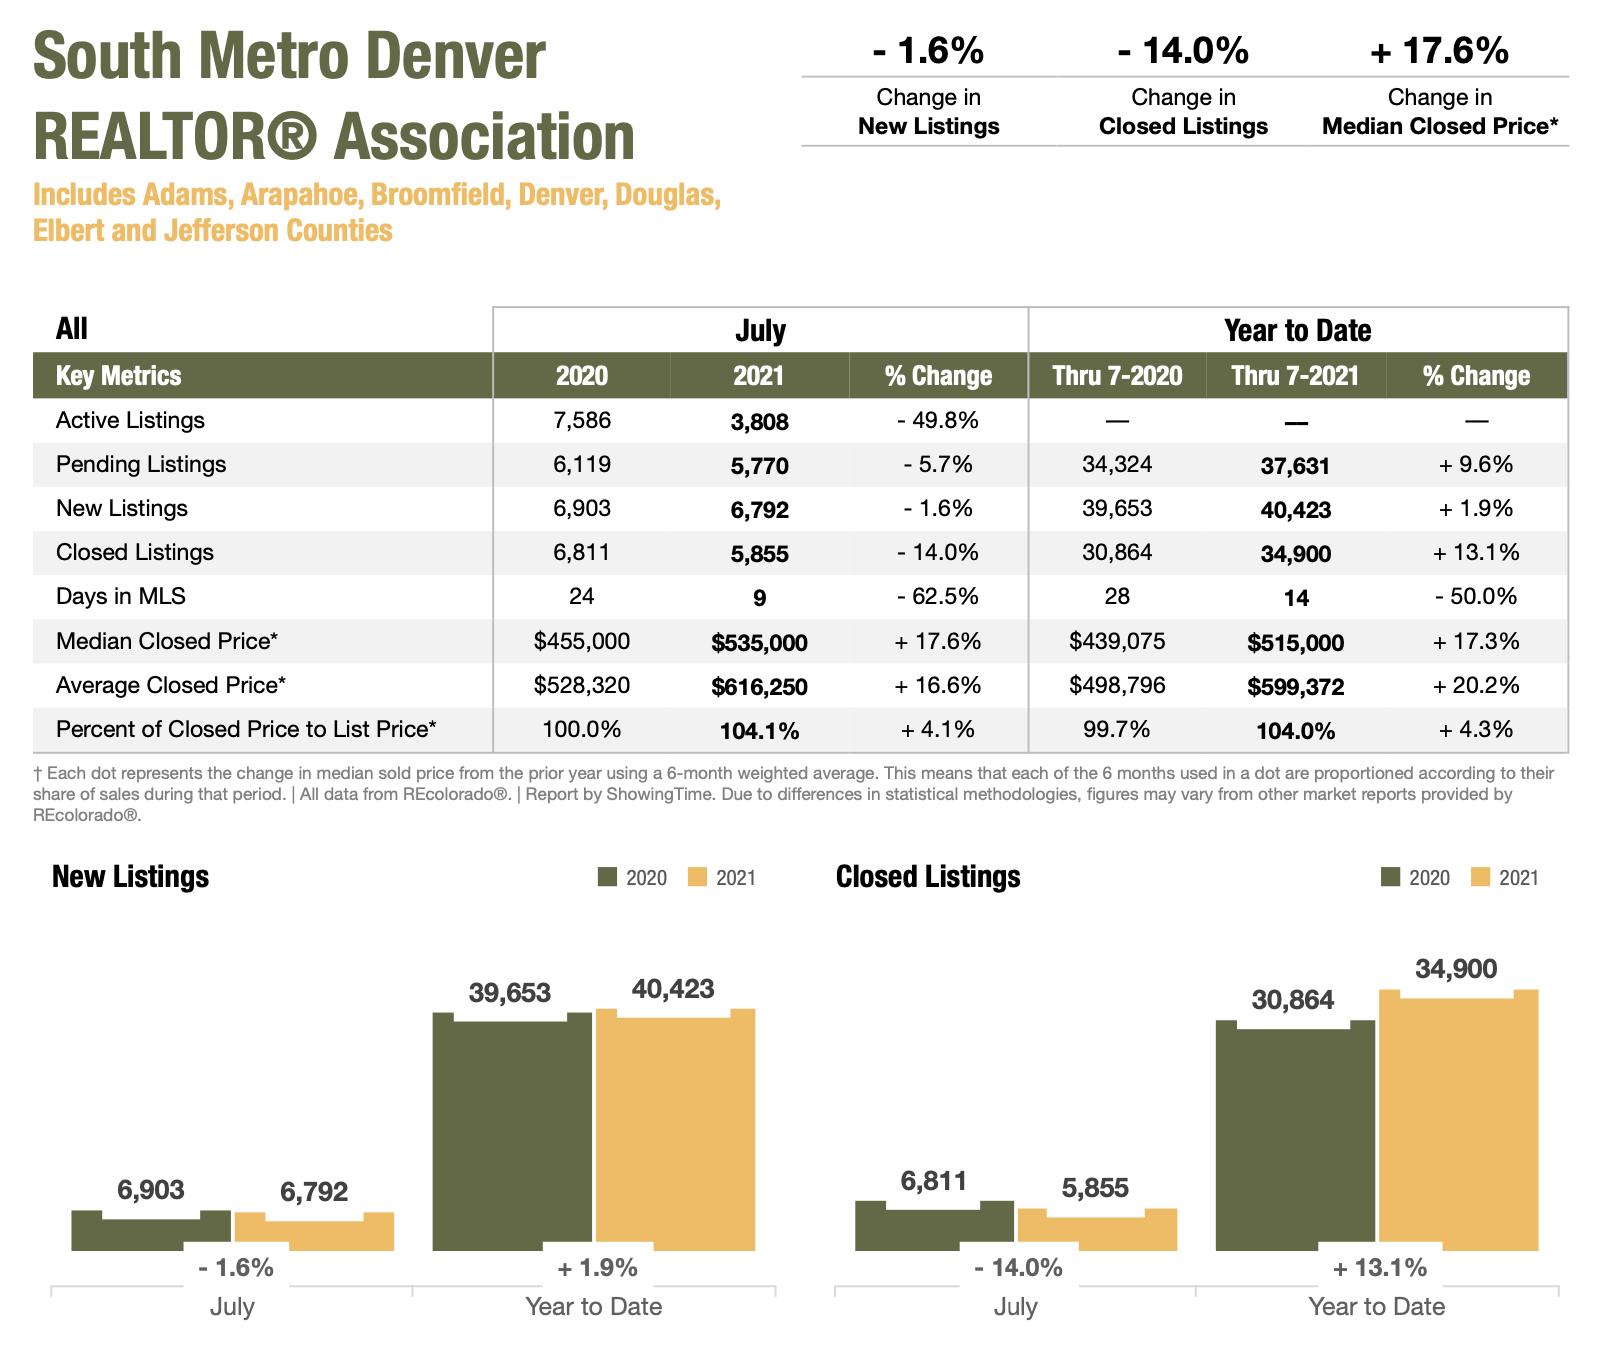 Colorado Real Estate Market Report South Metro Denver REALTOR Association July 2021